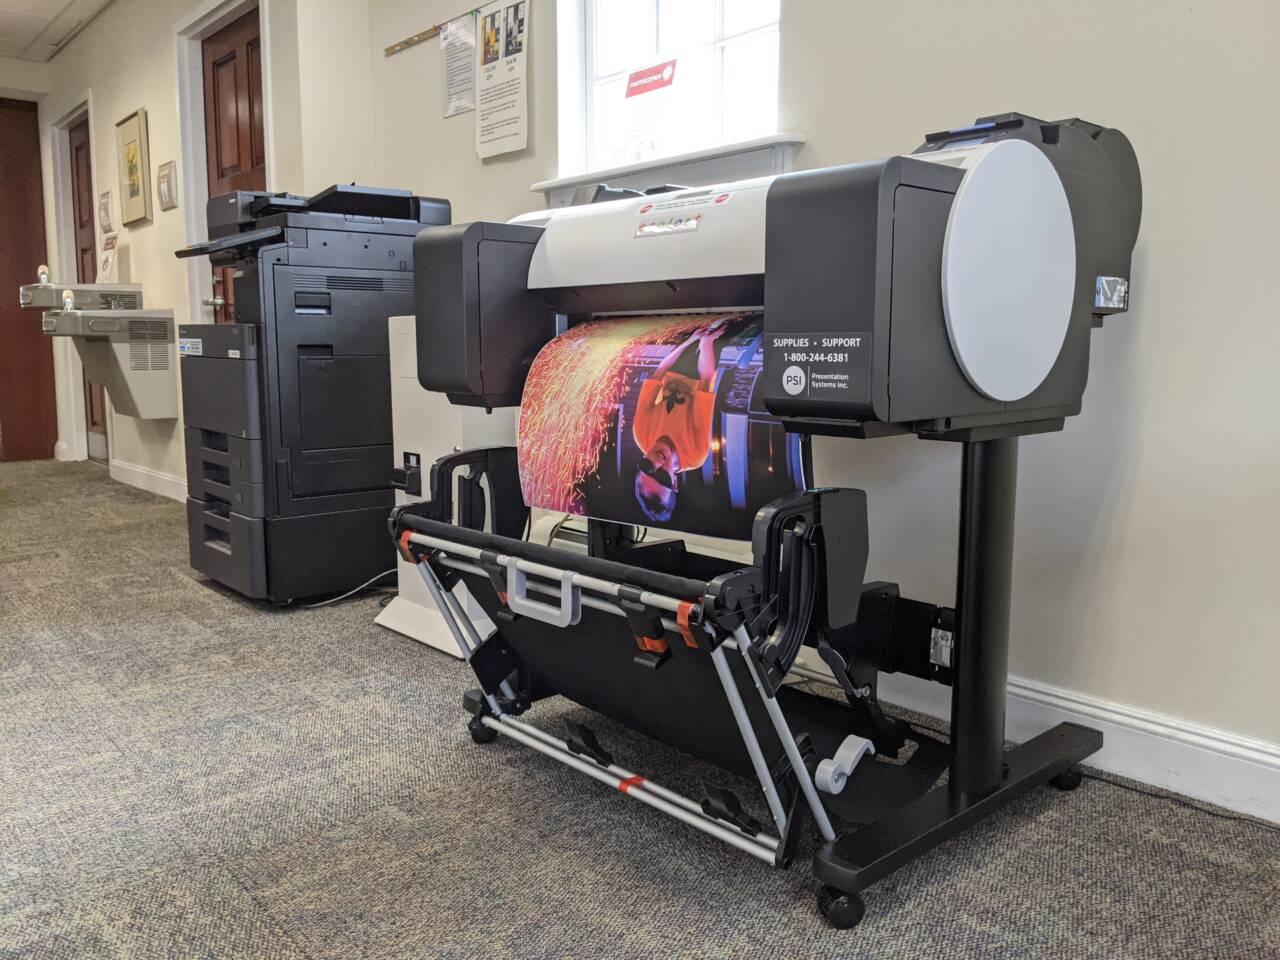 poster printer hillsdale free public